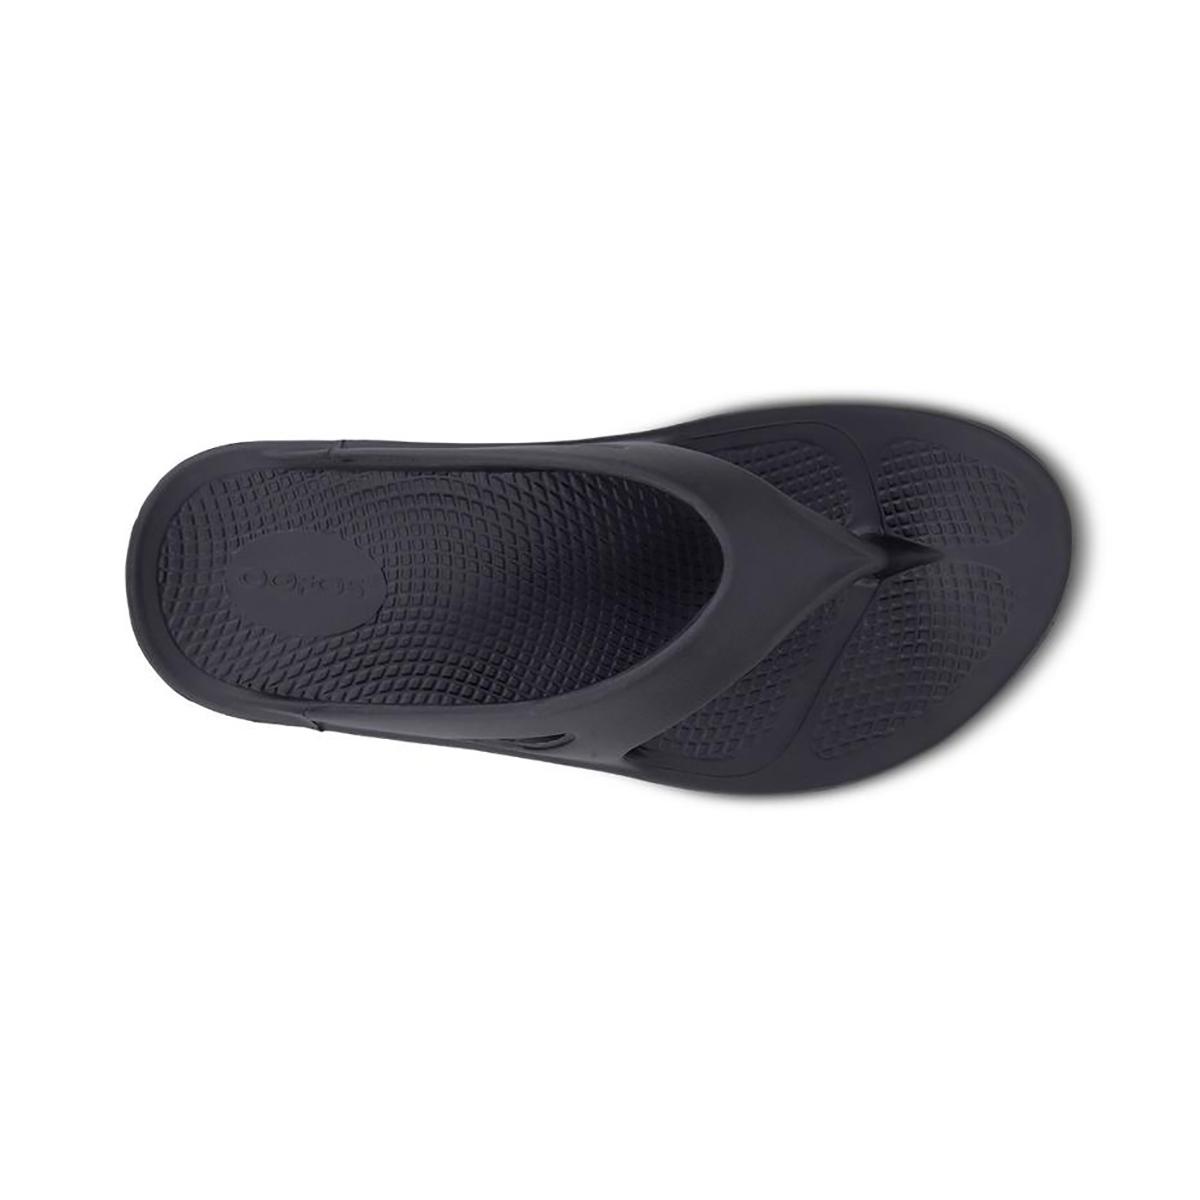 Oofos OOriginal Recovery Sandal - Color: Black - Size: M3/W5 - Width: Regular, Black, large, image 3